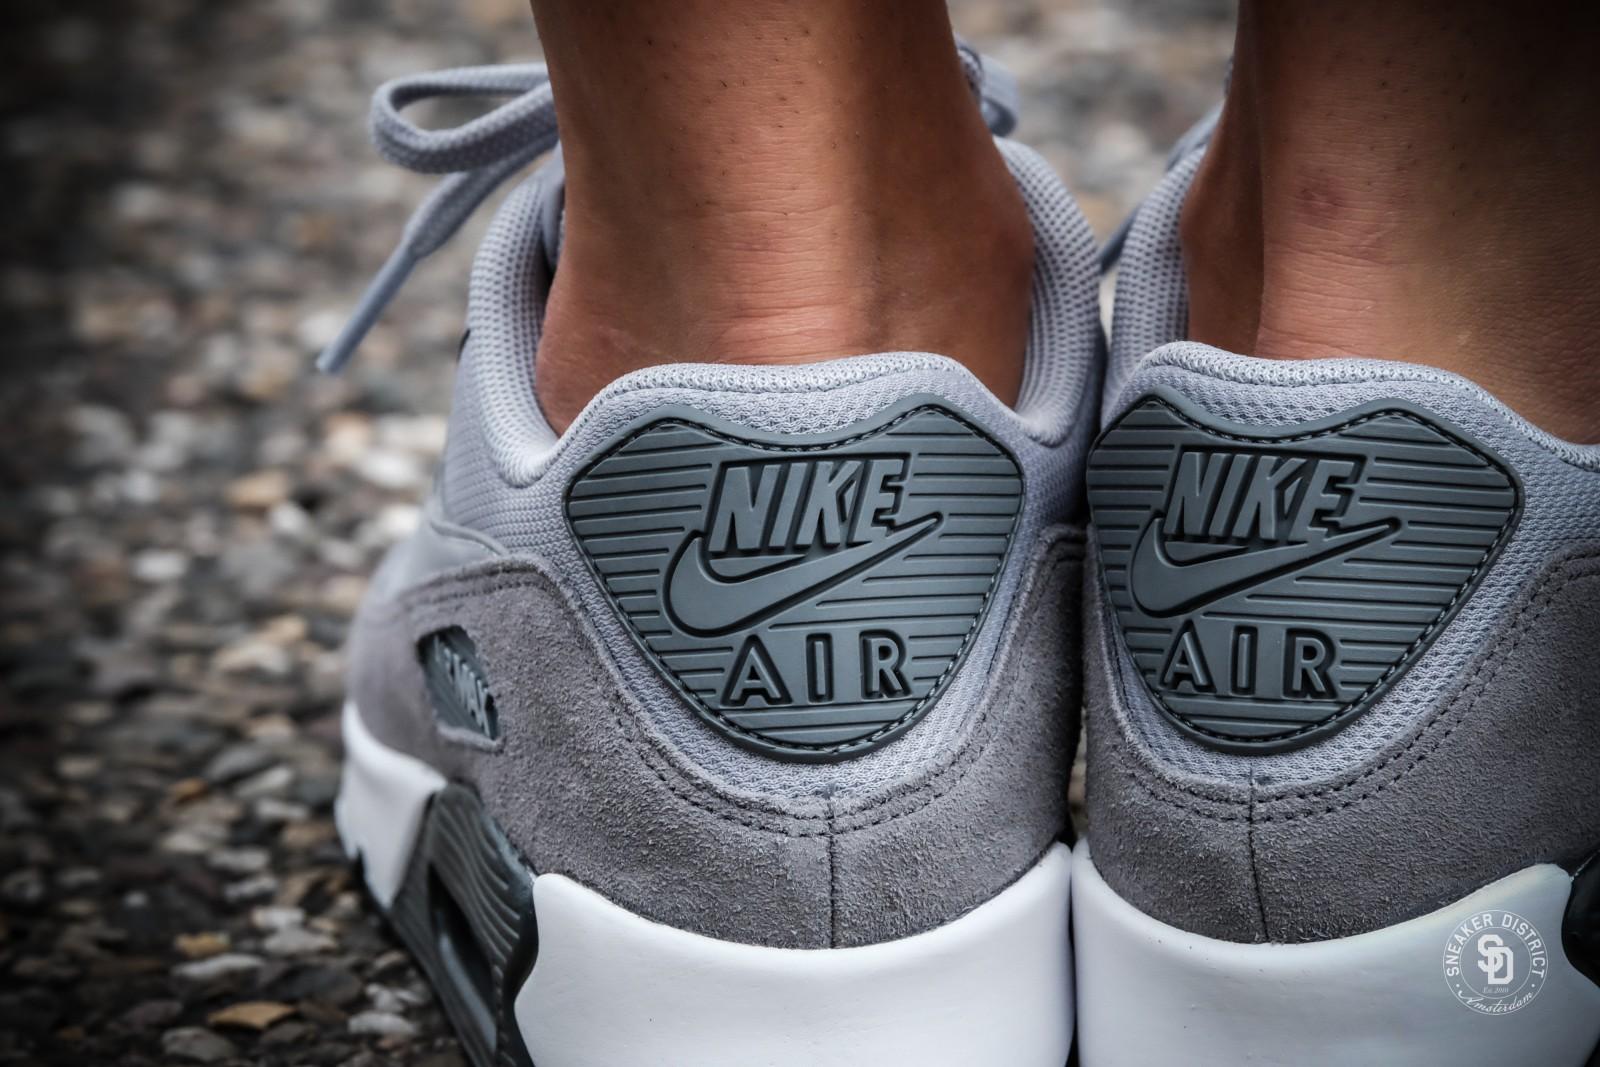 Nike Women's Air Max 90 Cool GreyAnthracite White | Dames